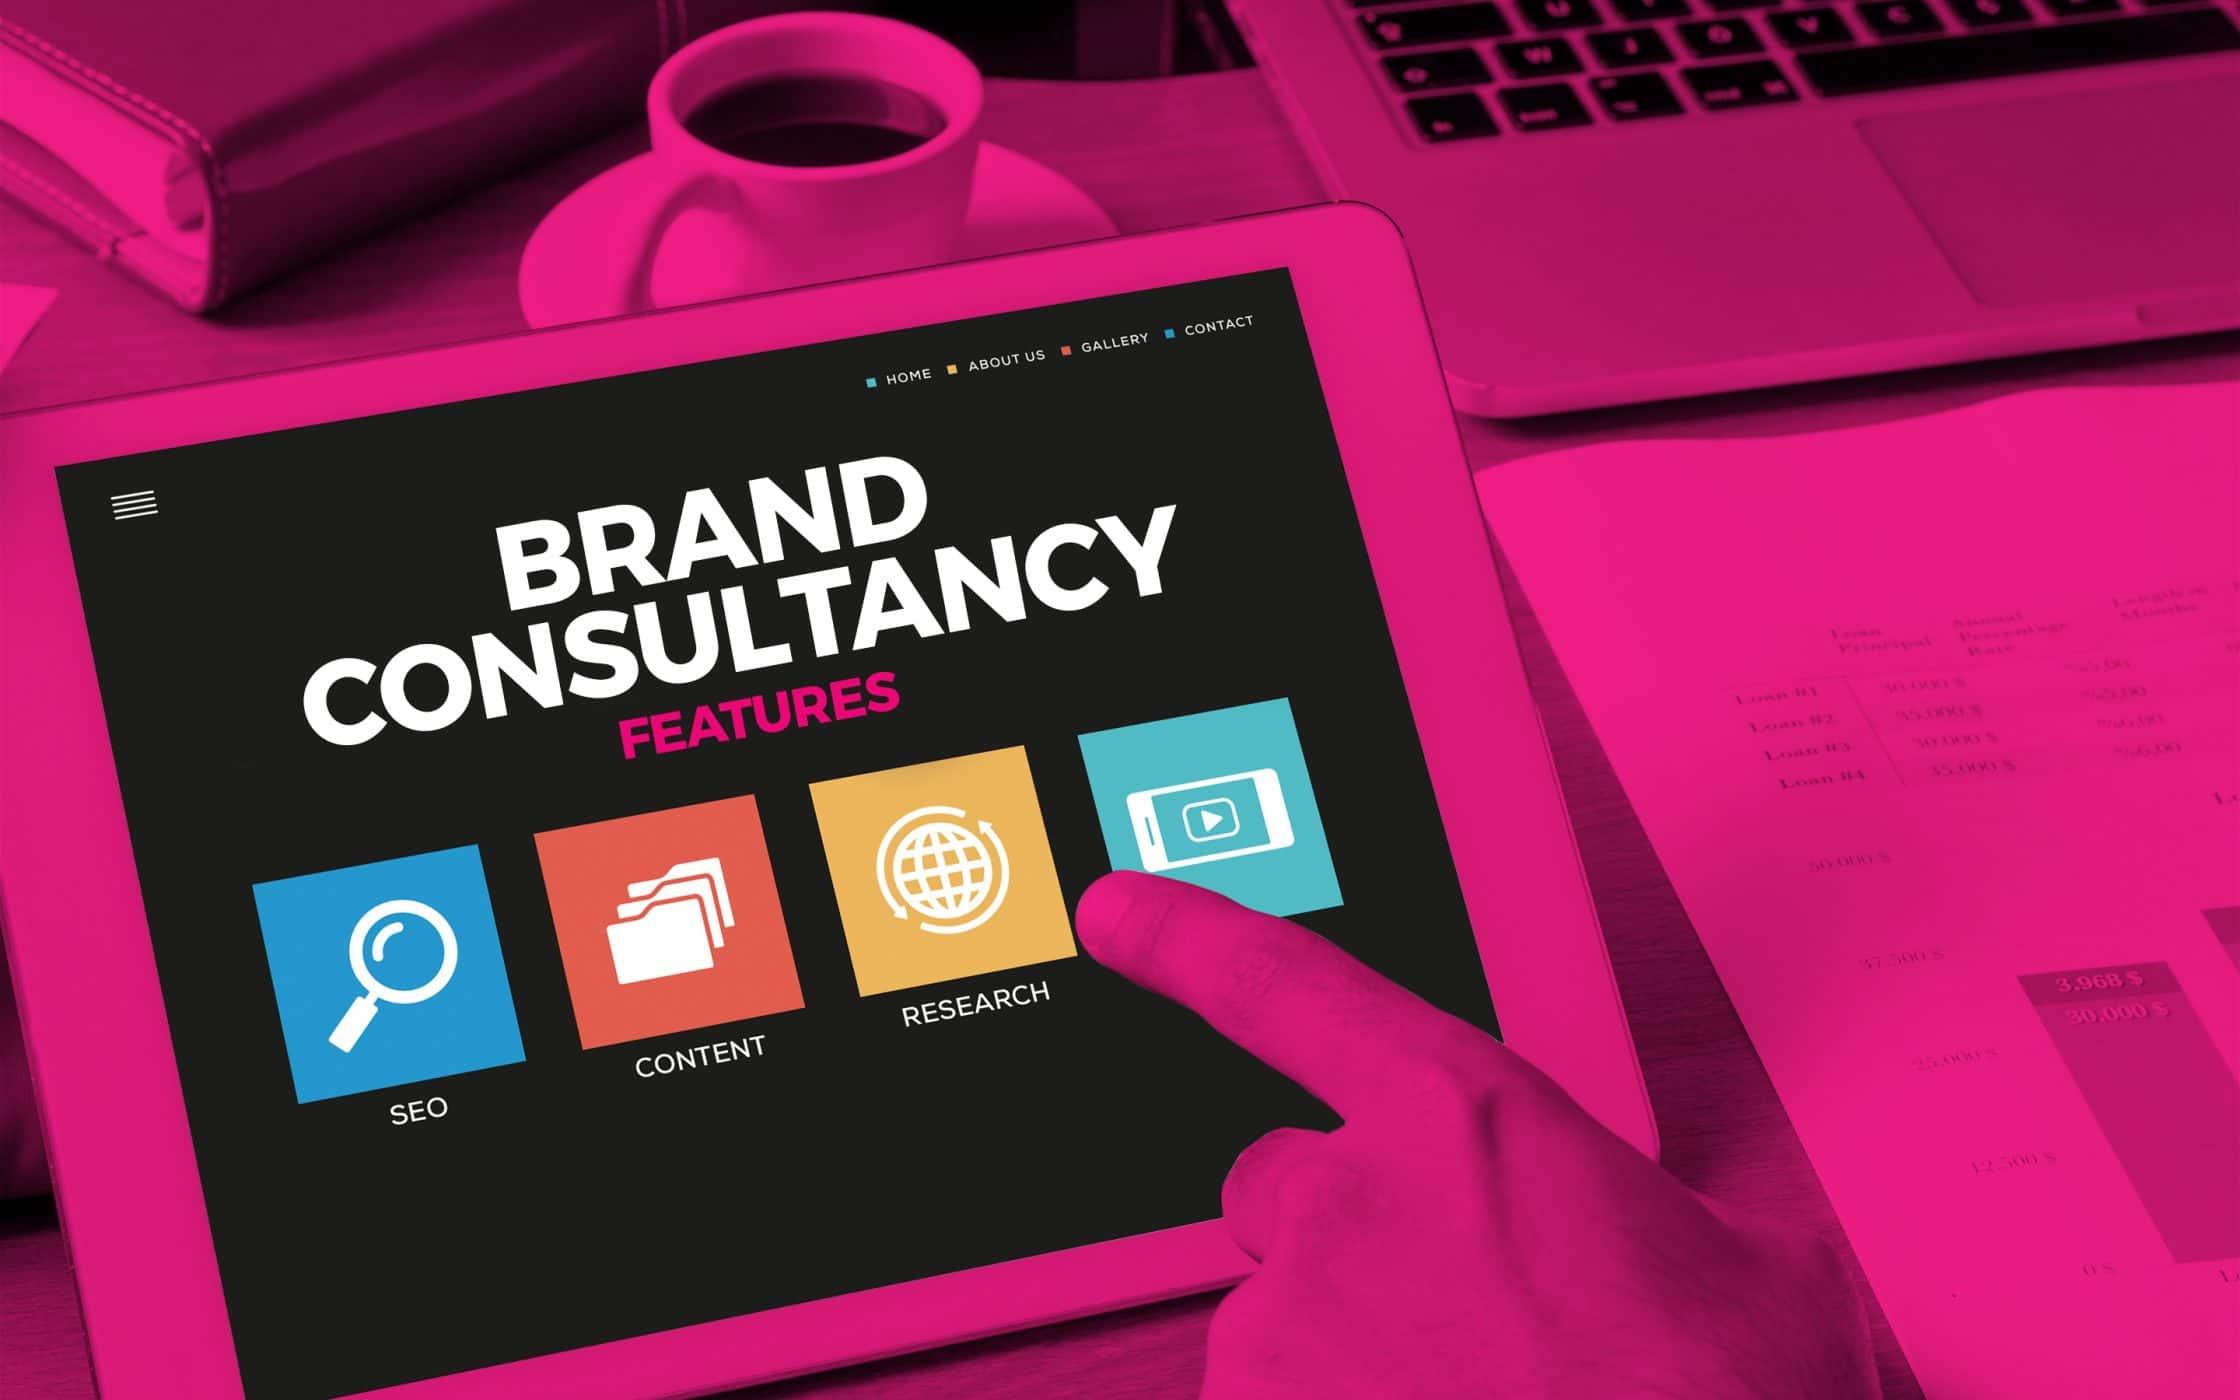 Brand Consultancy London